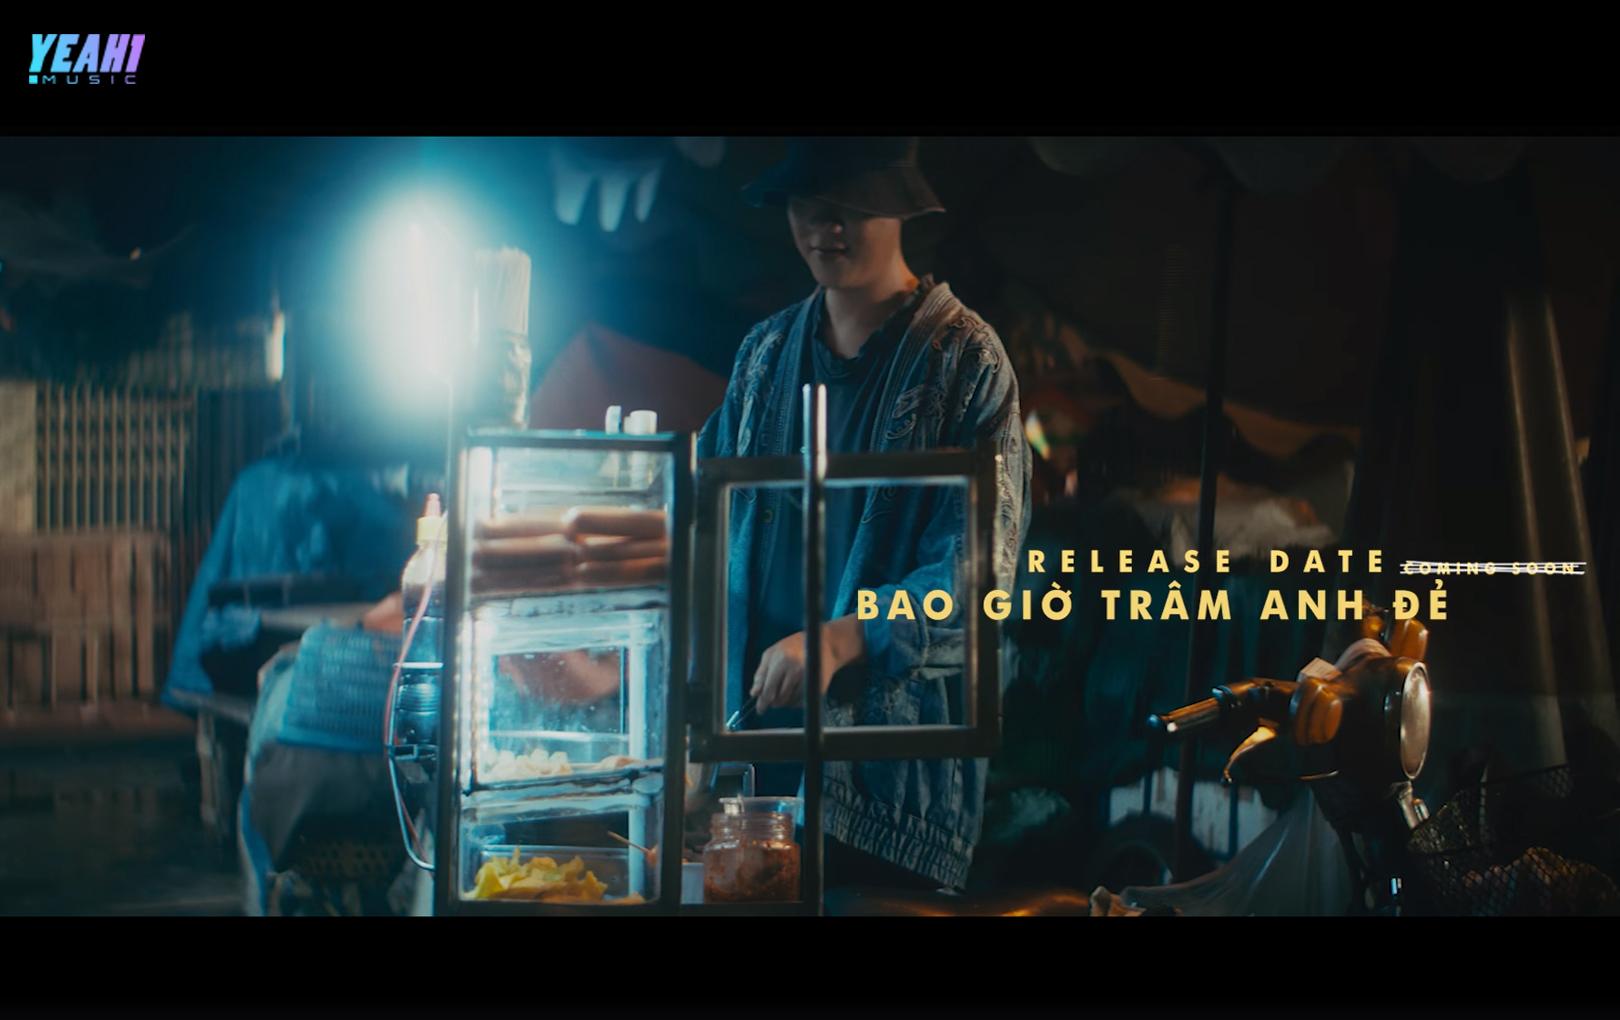 JustaTee tung trailer sản phẩm mới - Thằng Hấp